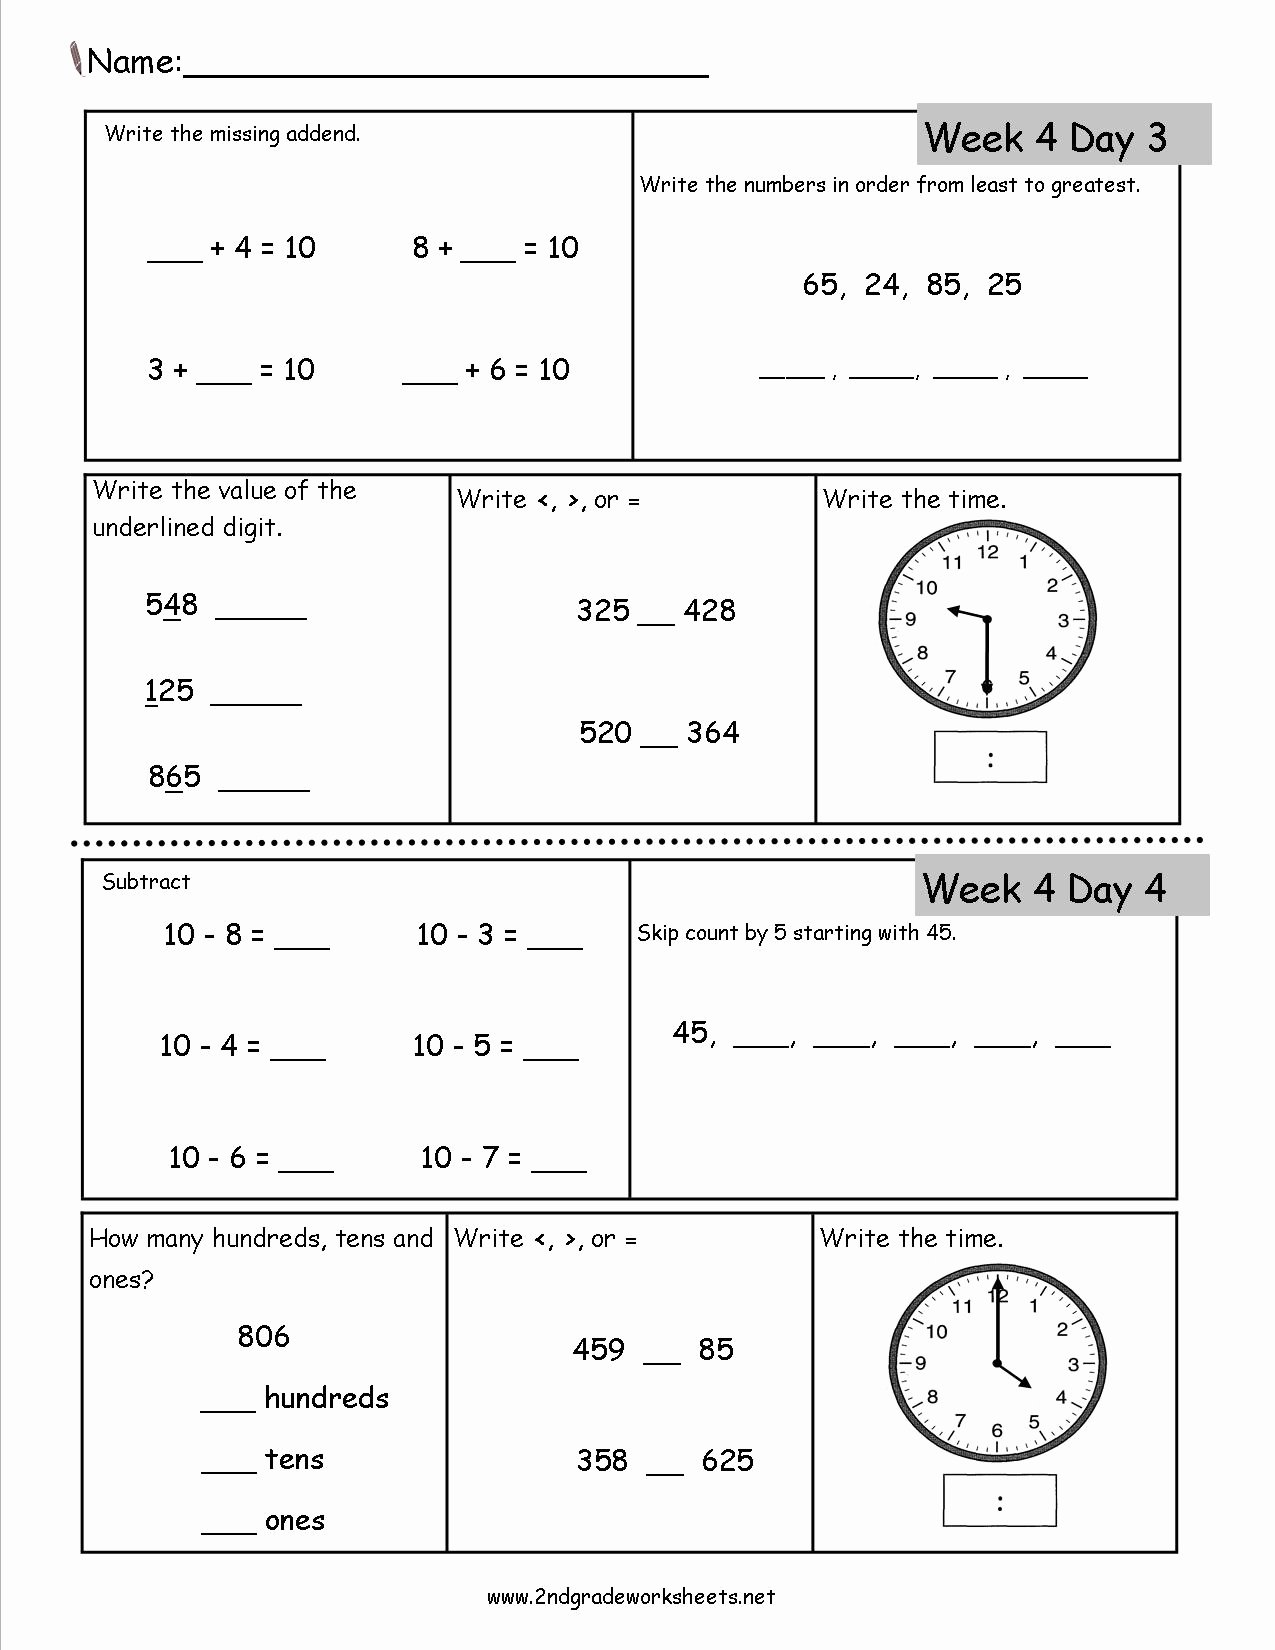 2nd Grade Math Worksheet Pdf Elegant Free 2nd Grade Daily Math Worksheets